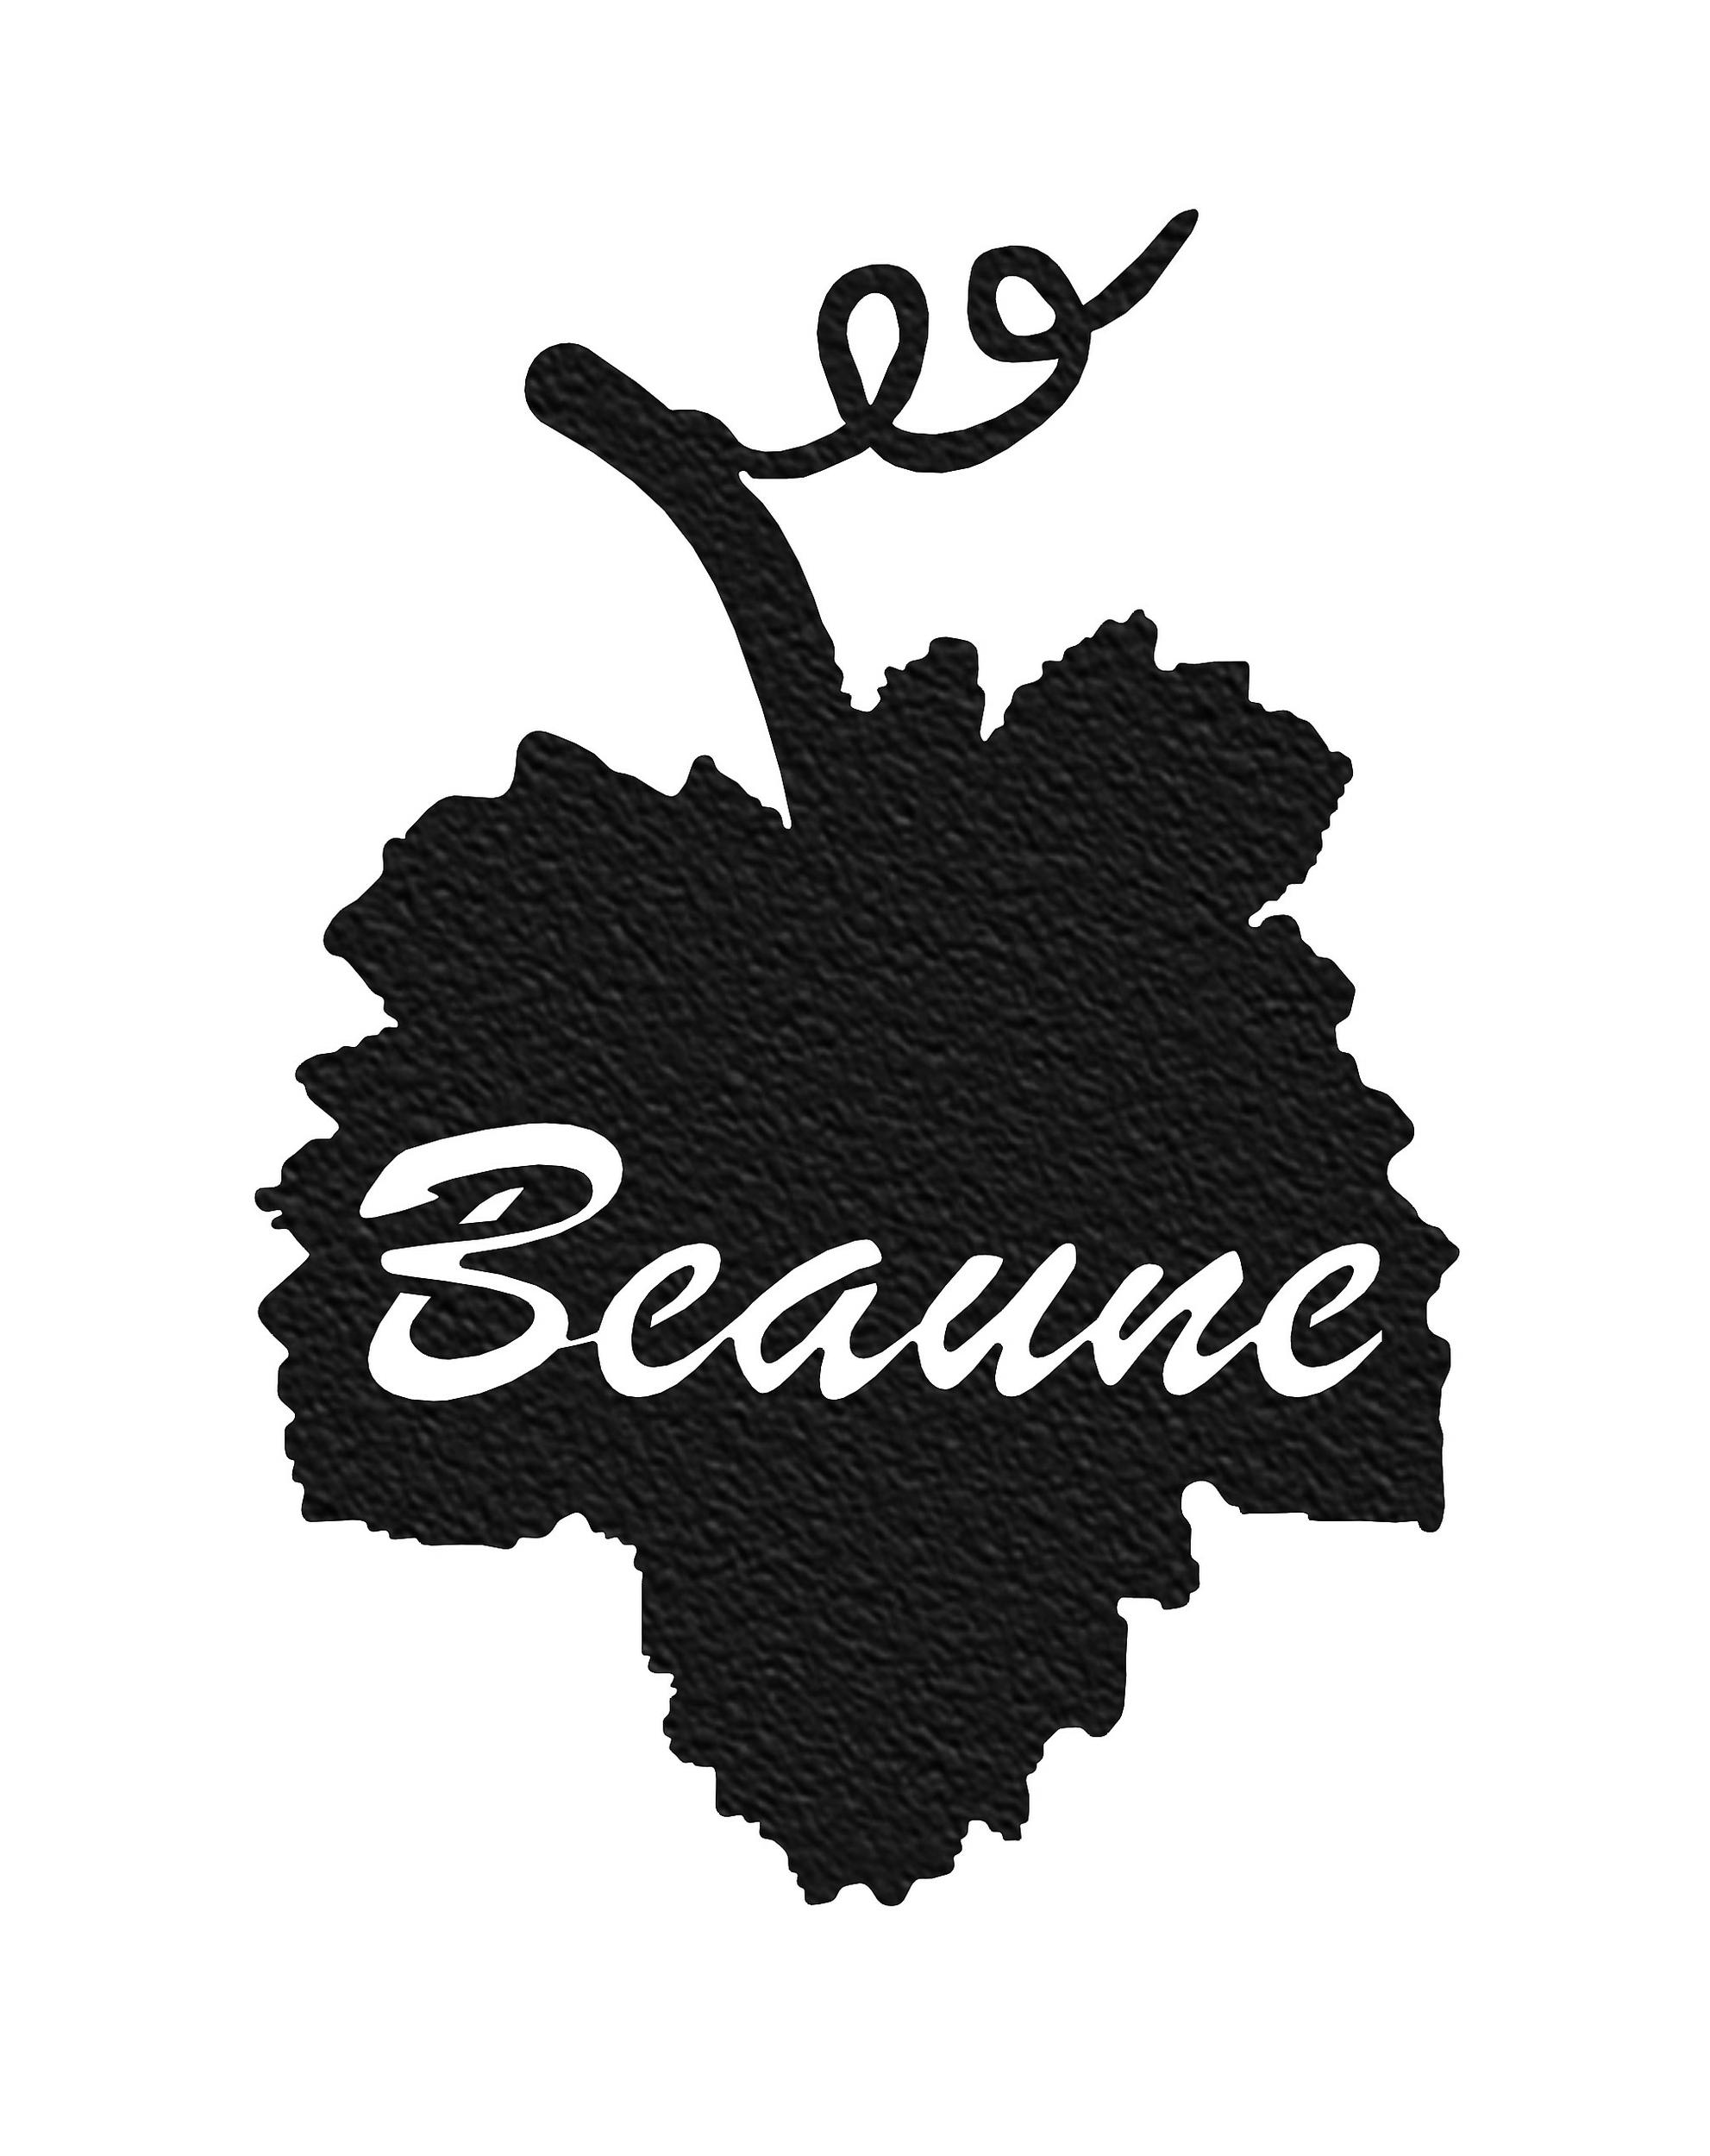 La feuille Beaunoise